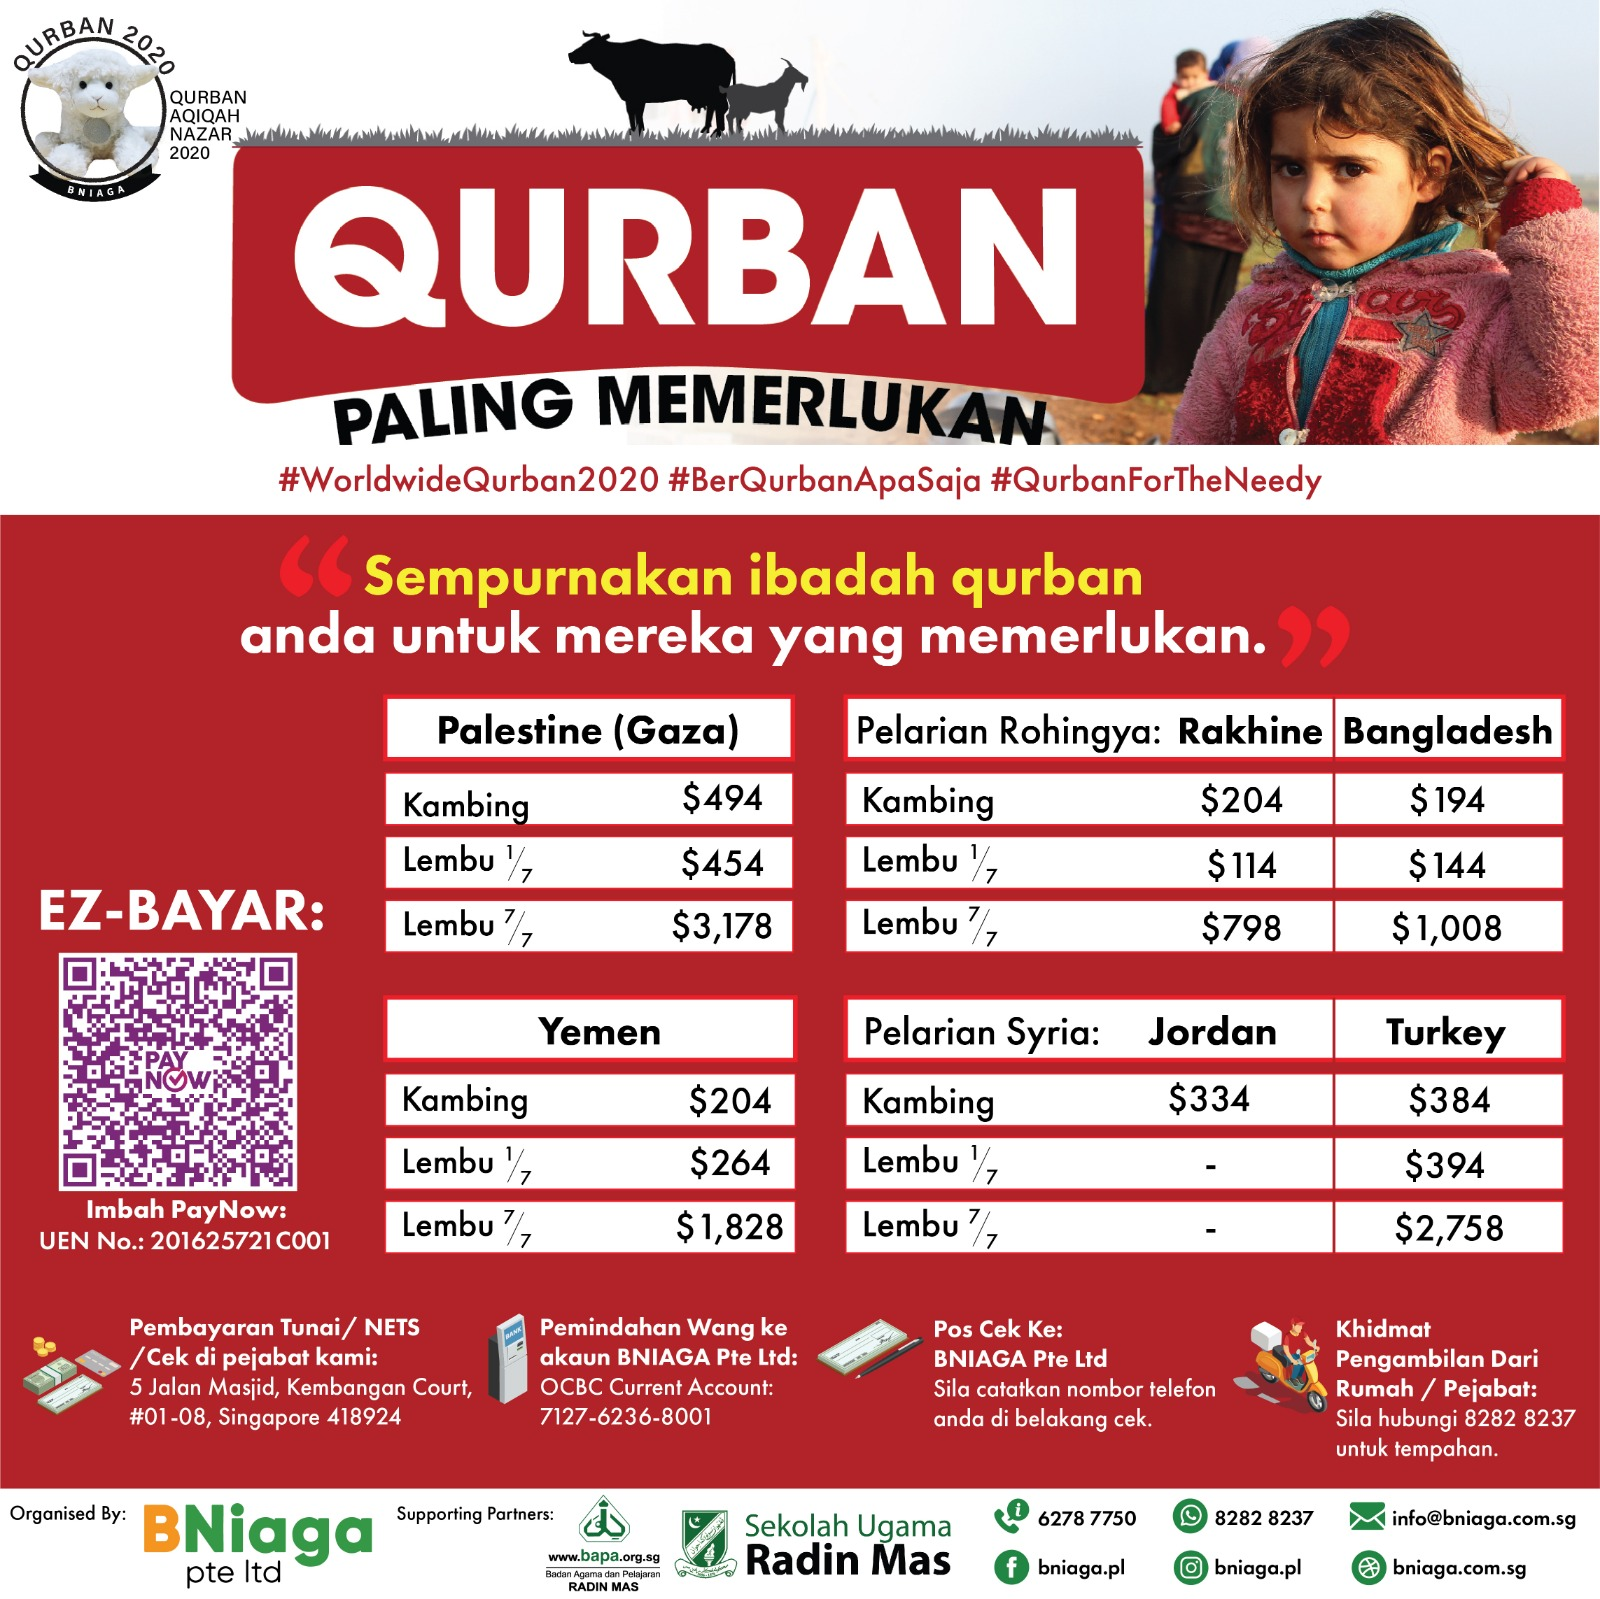 Most Needed - Qurban Paling Memerlukan